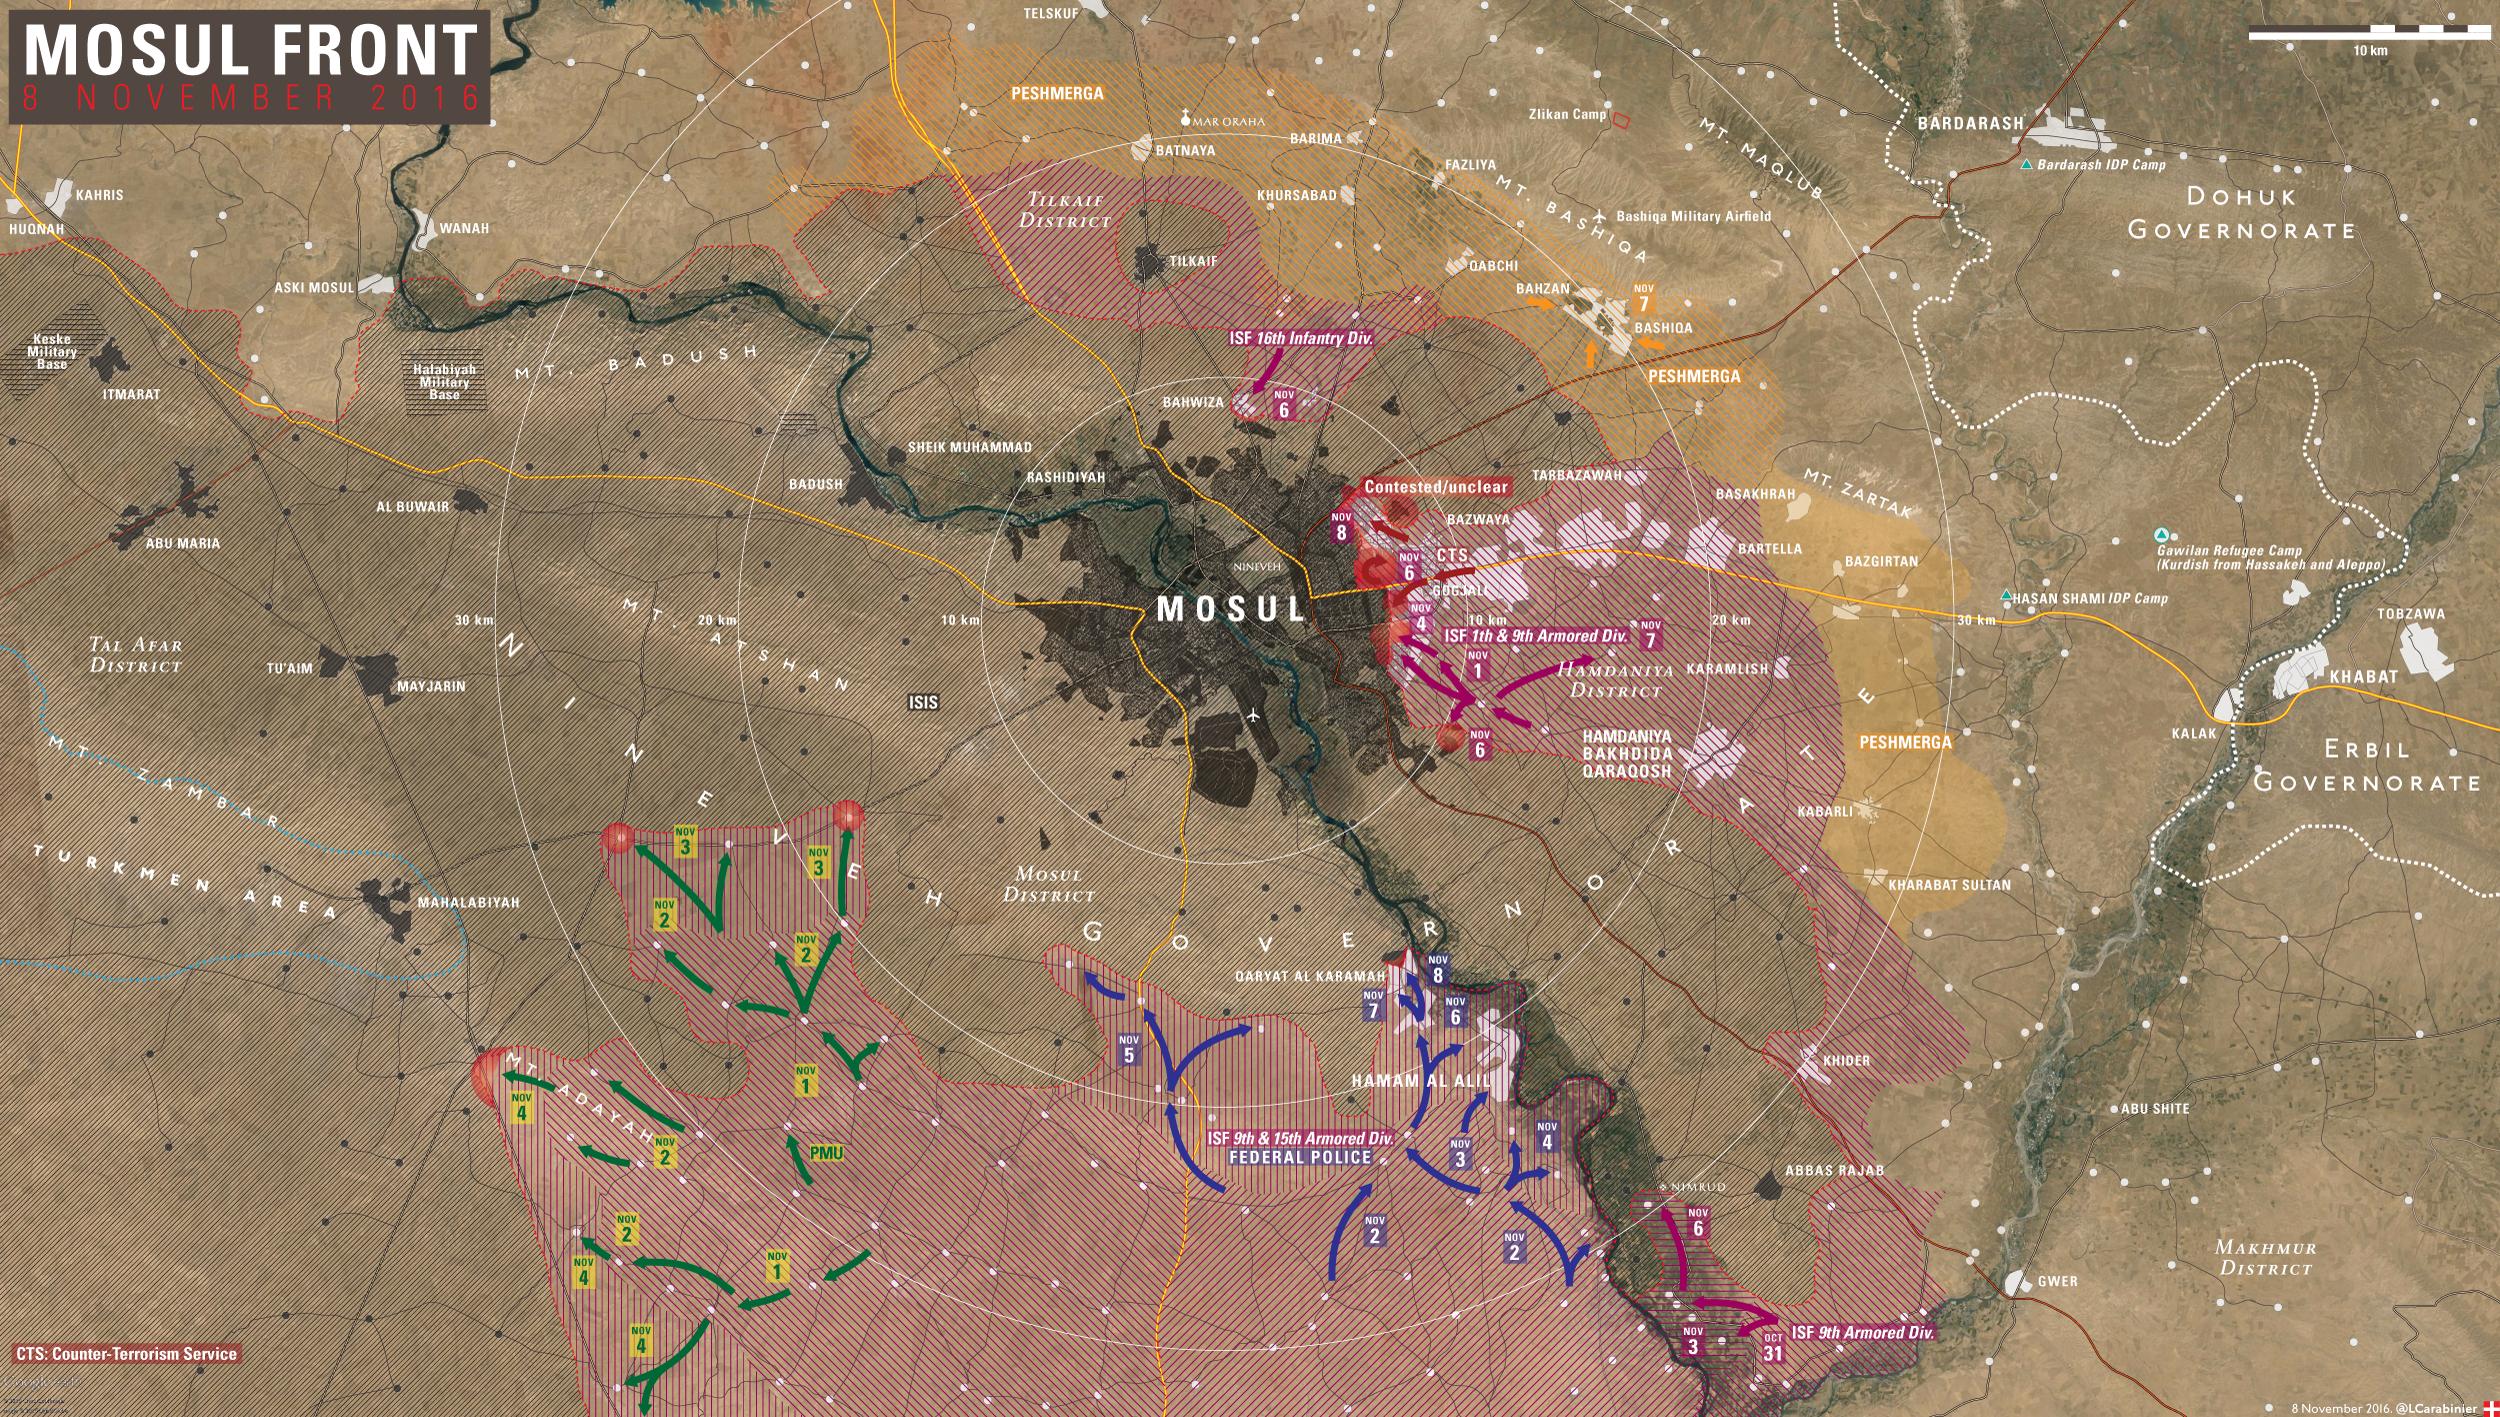 Iraqi Map Update: Battle for Mosul on November 8, 2016